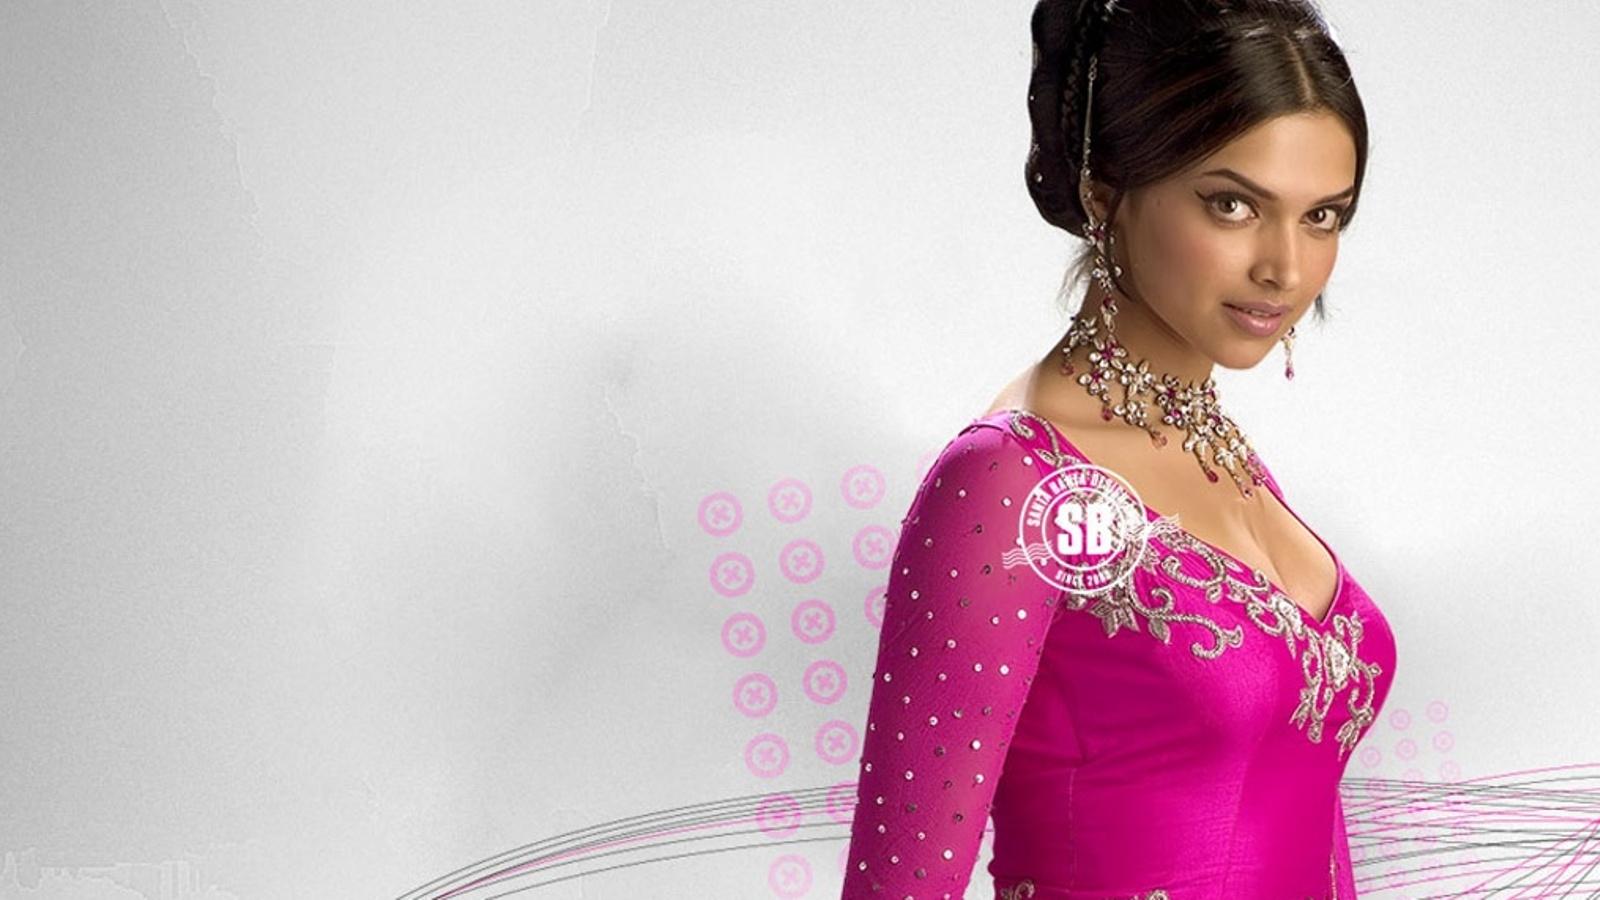 INDIAN MUSIC: Hindi Wallpapers